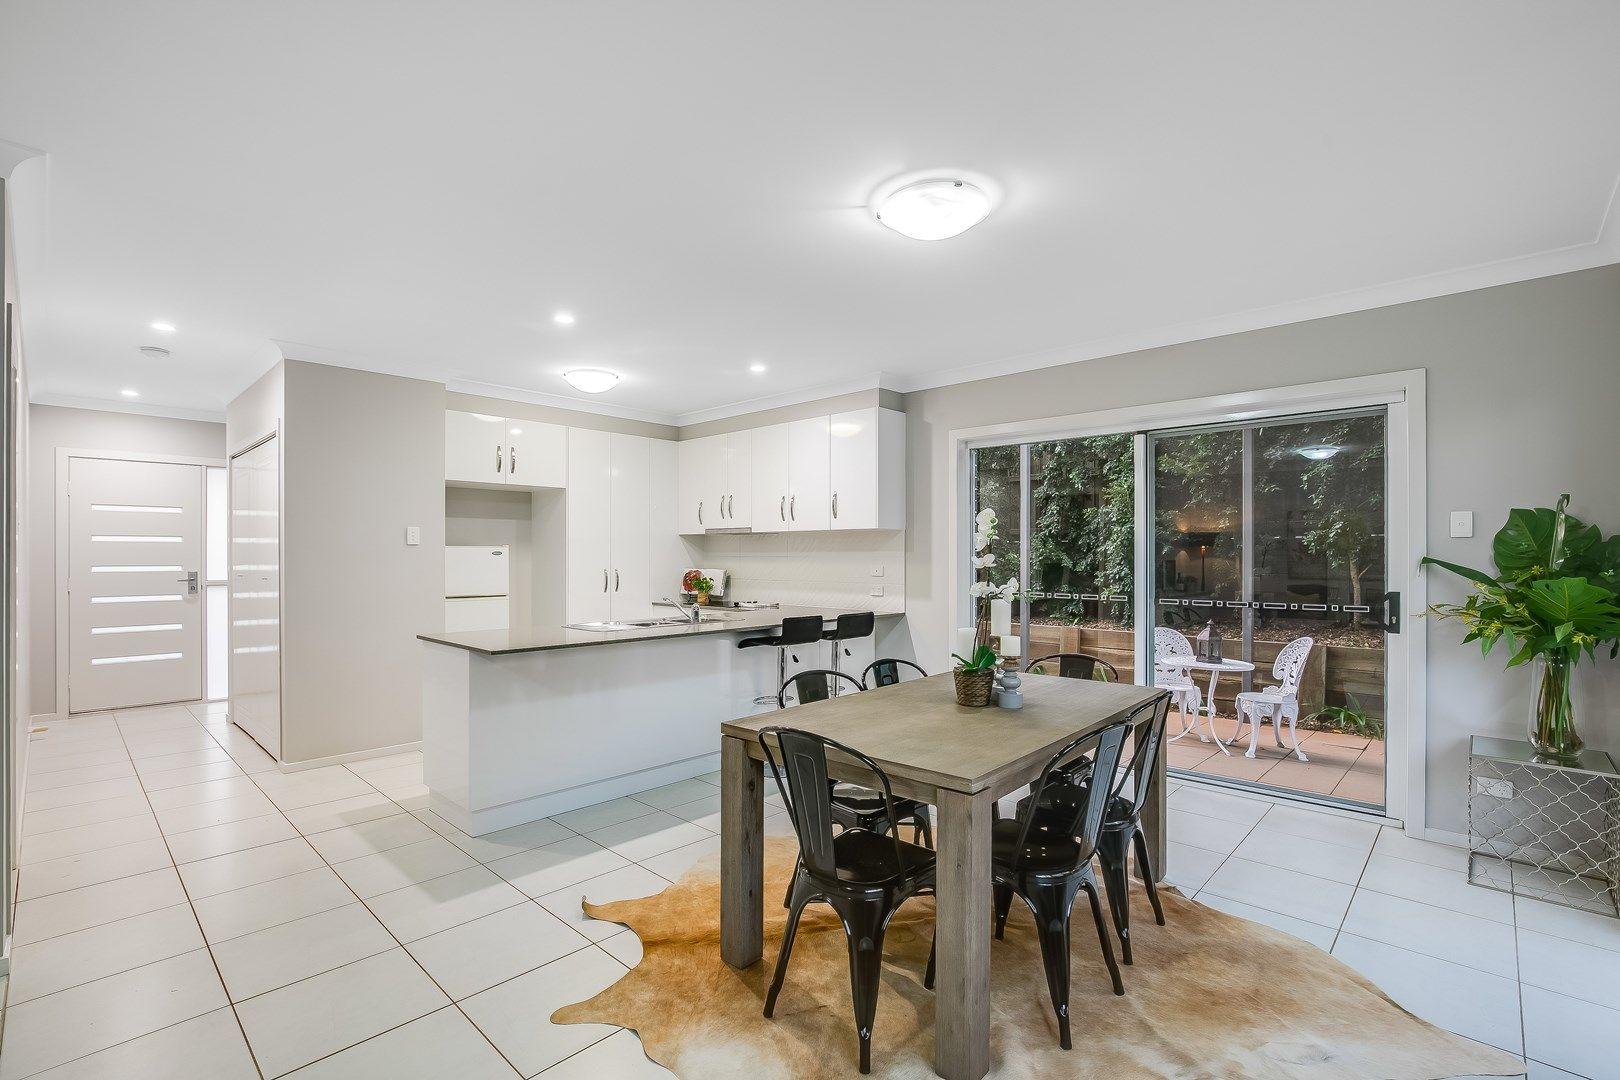 2/5 Messines Street, Harlaxton QLD 4350, Image 0